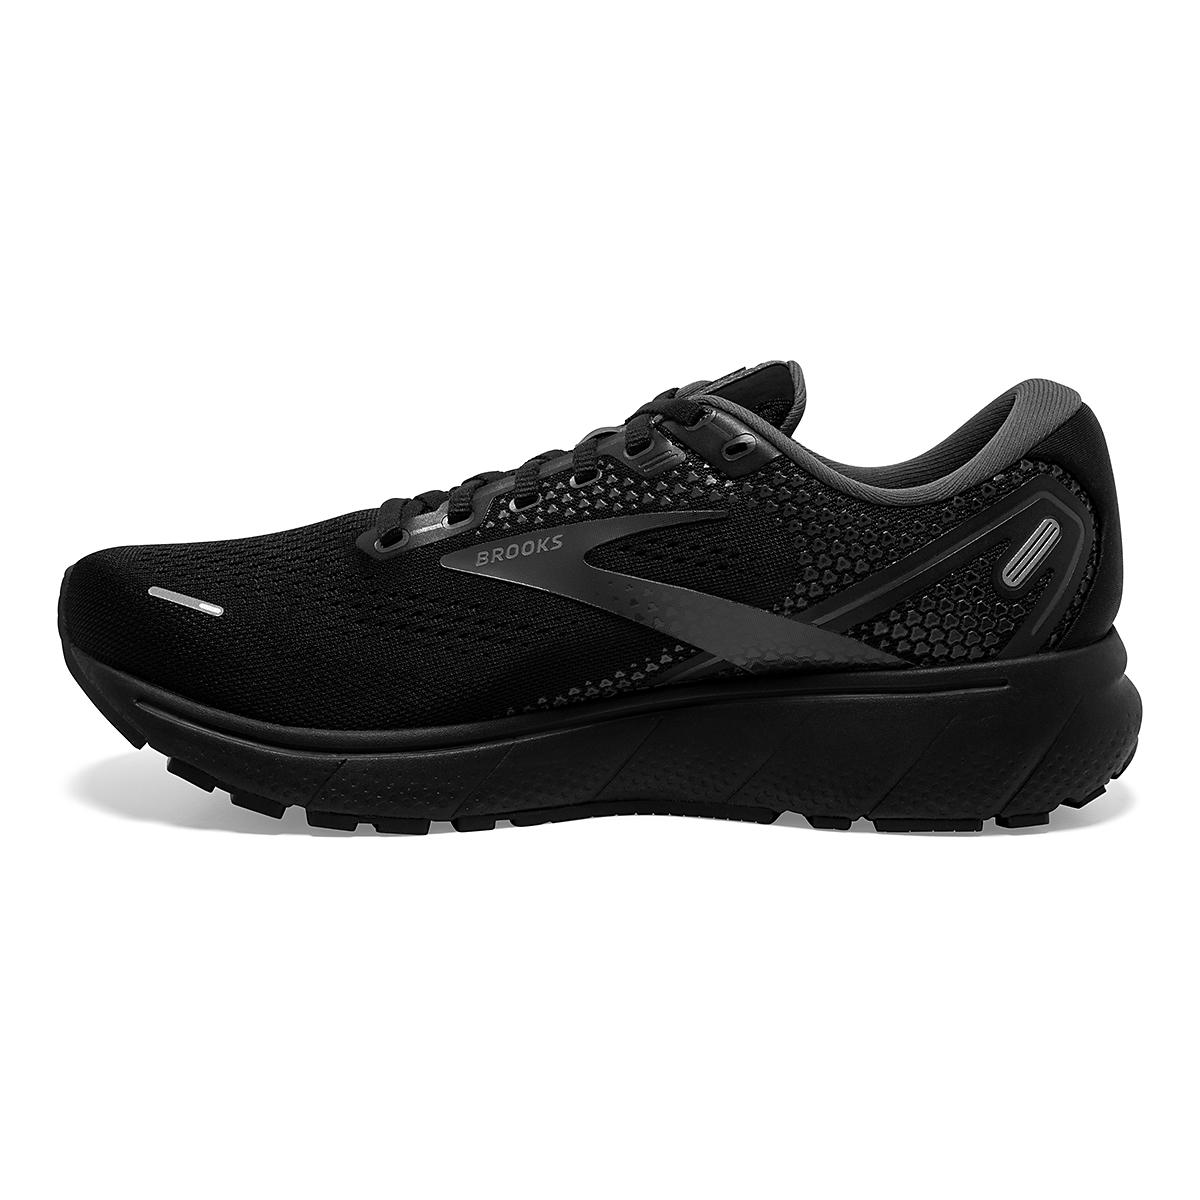 Men's Brooks Ghost 14 Running Shoe - Color: Black/Black/Ebony - Size: 7 - Width: Regular, Black/Black/Ebony, large, image 2